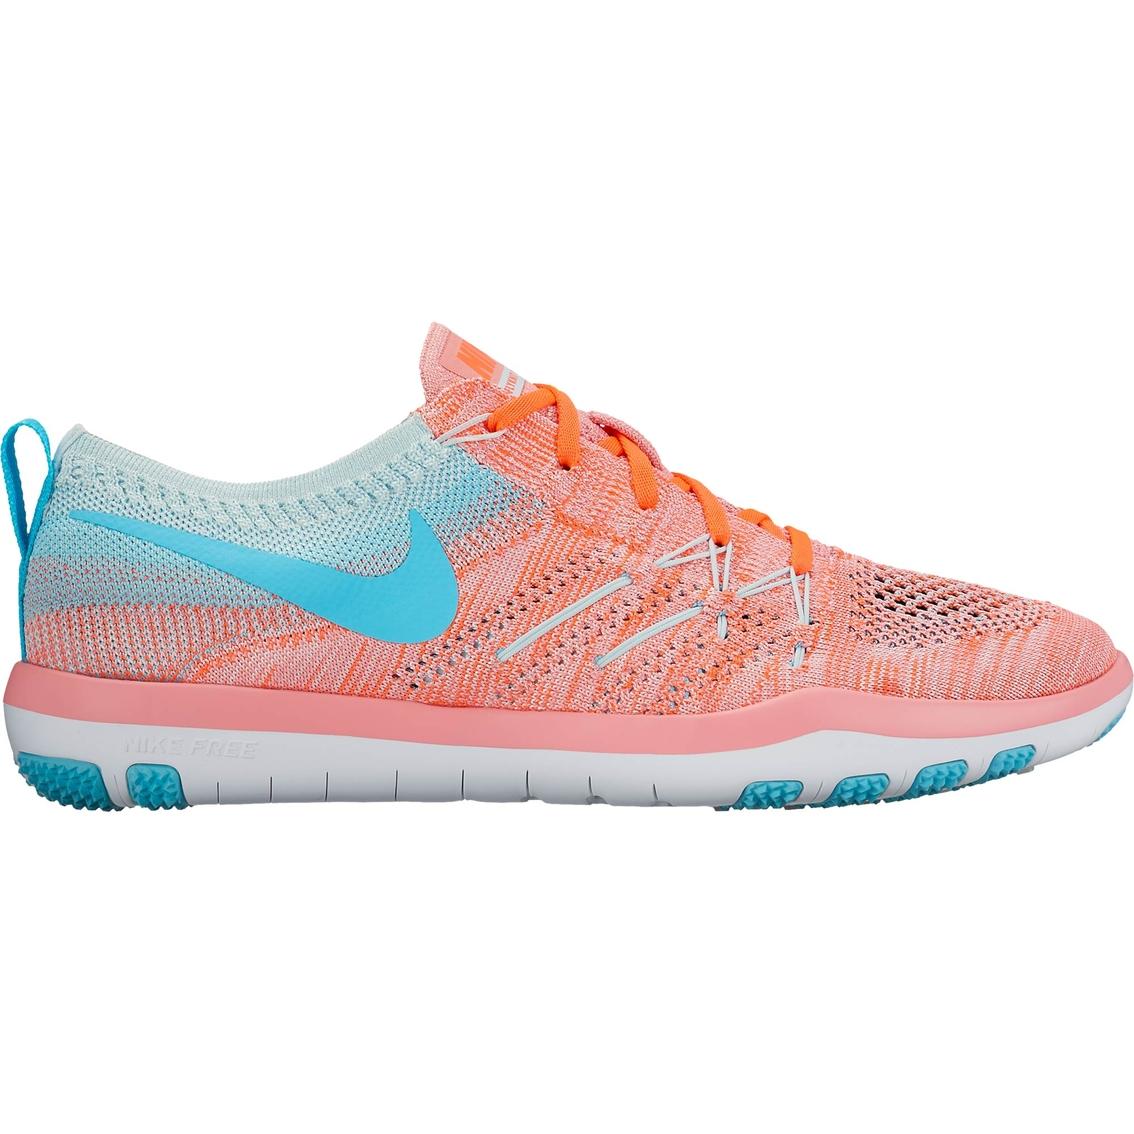 69608b3daa054 Nike Women s Free Tr Focus Flyknit Training Shoes